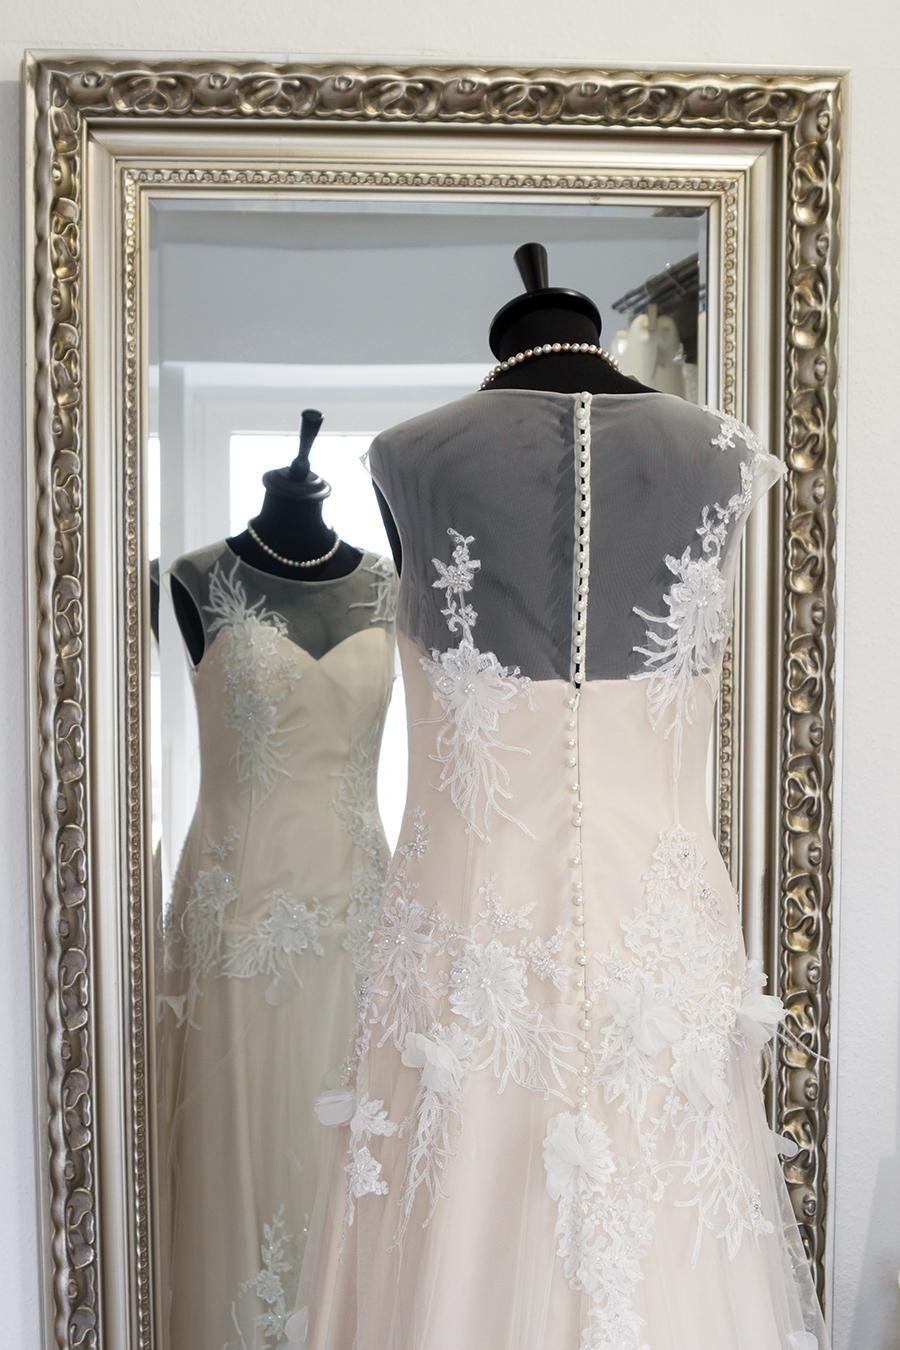 Galerie - Brautkleid Karussell